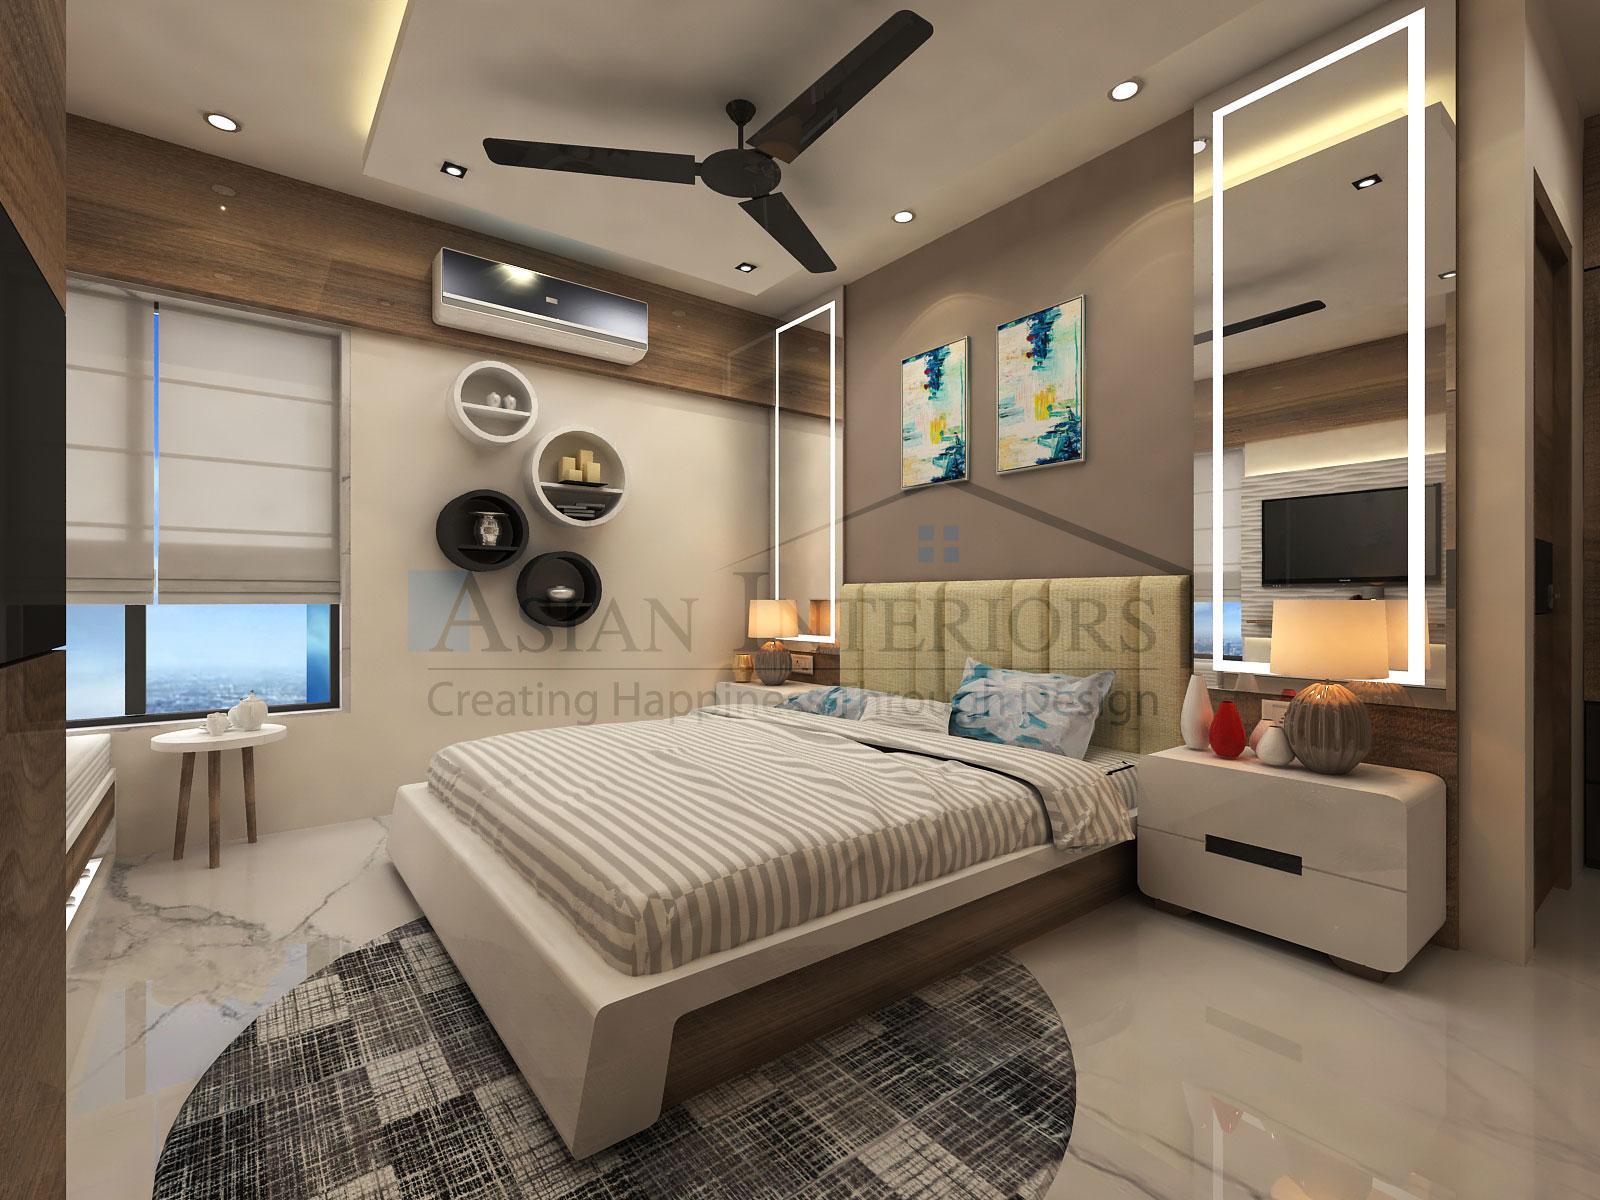 Asian-Interiors-BedRoom5